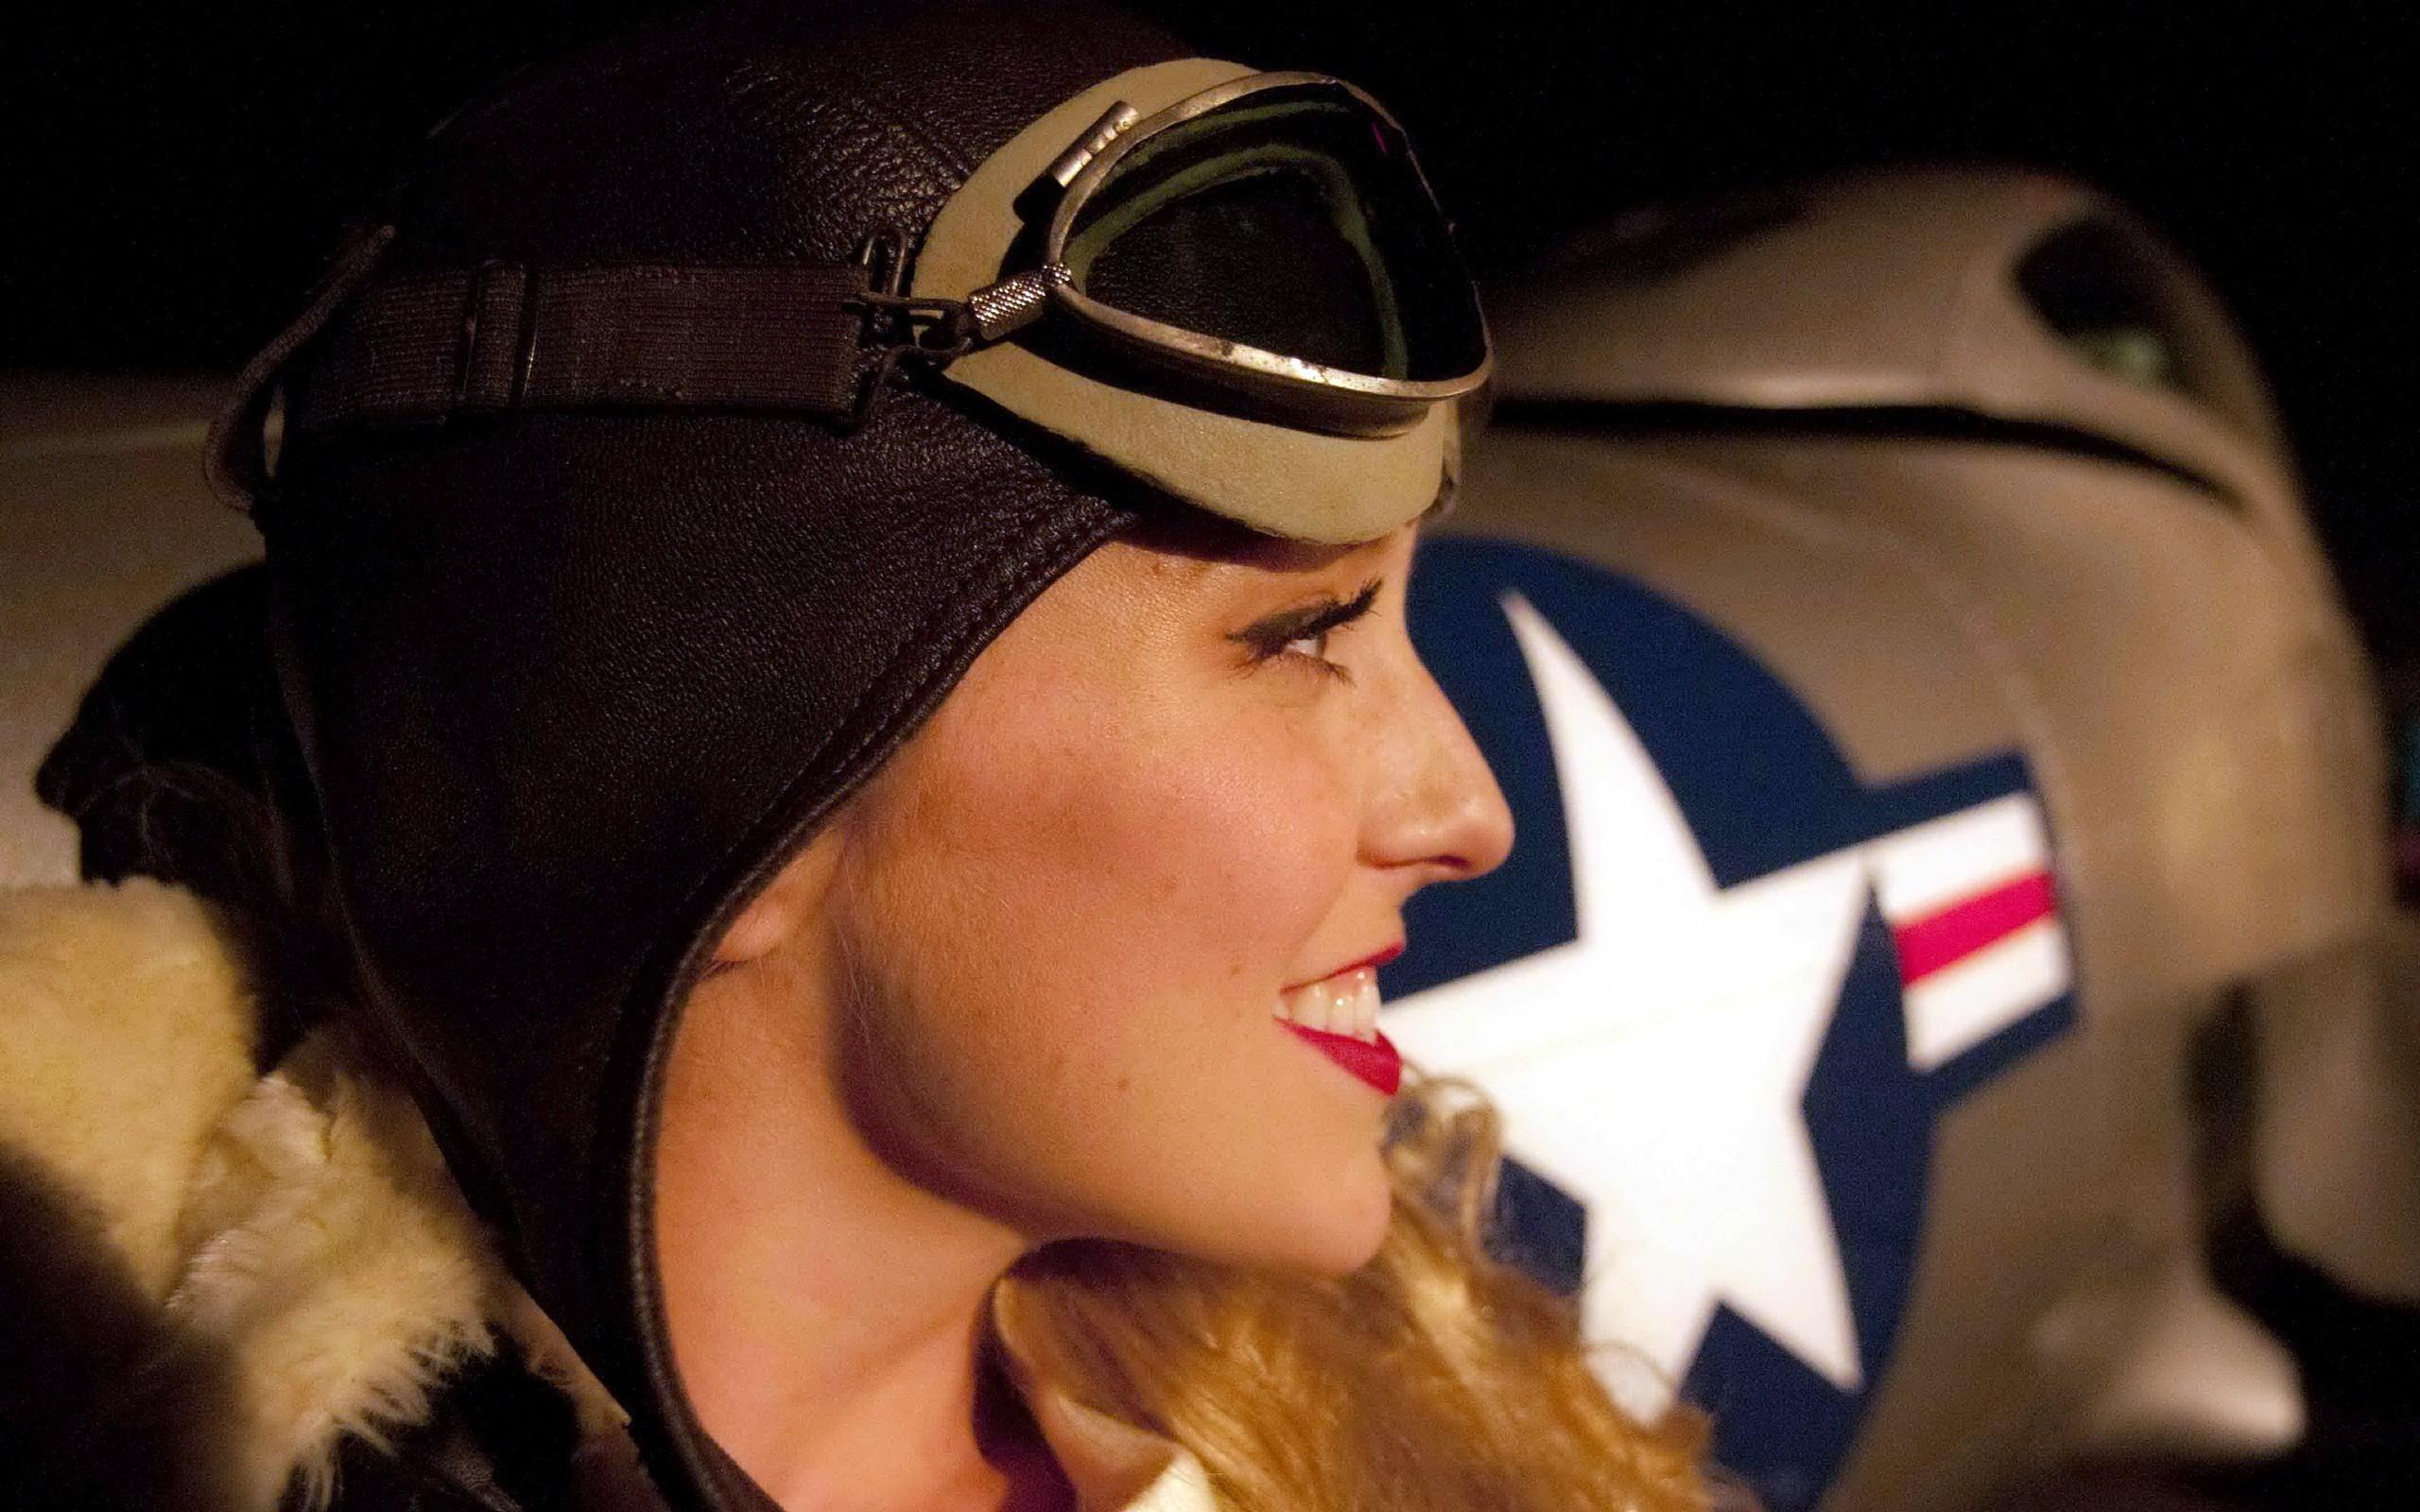 Una chica piloto de aviones - 2560x1600